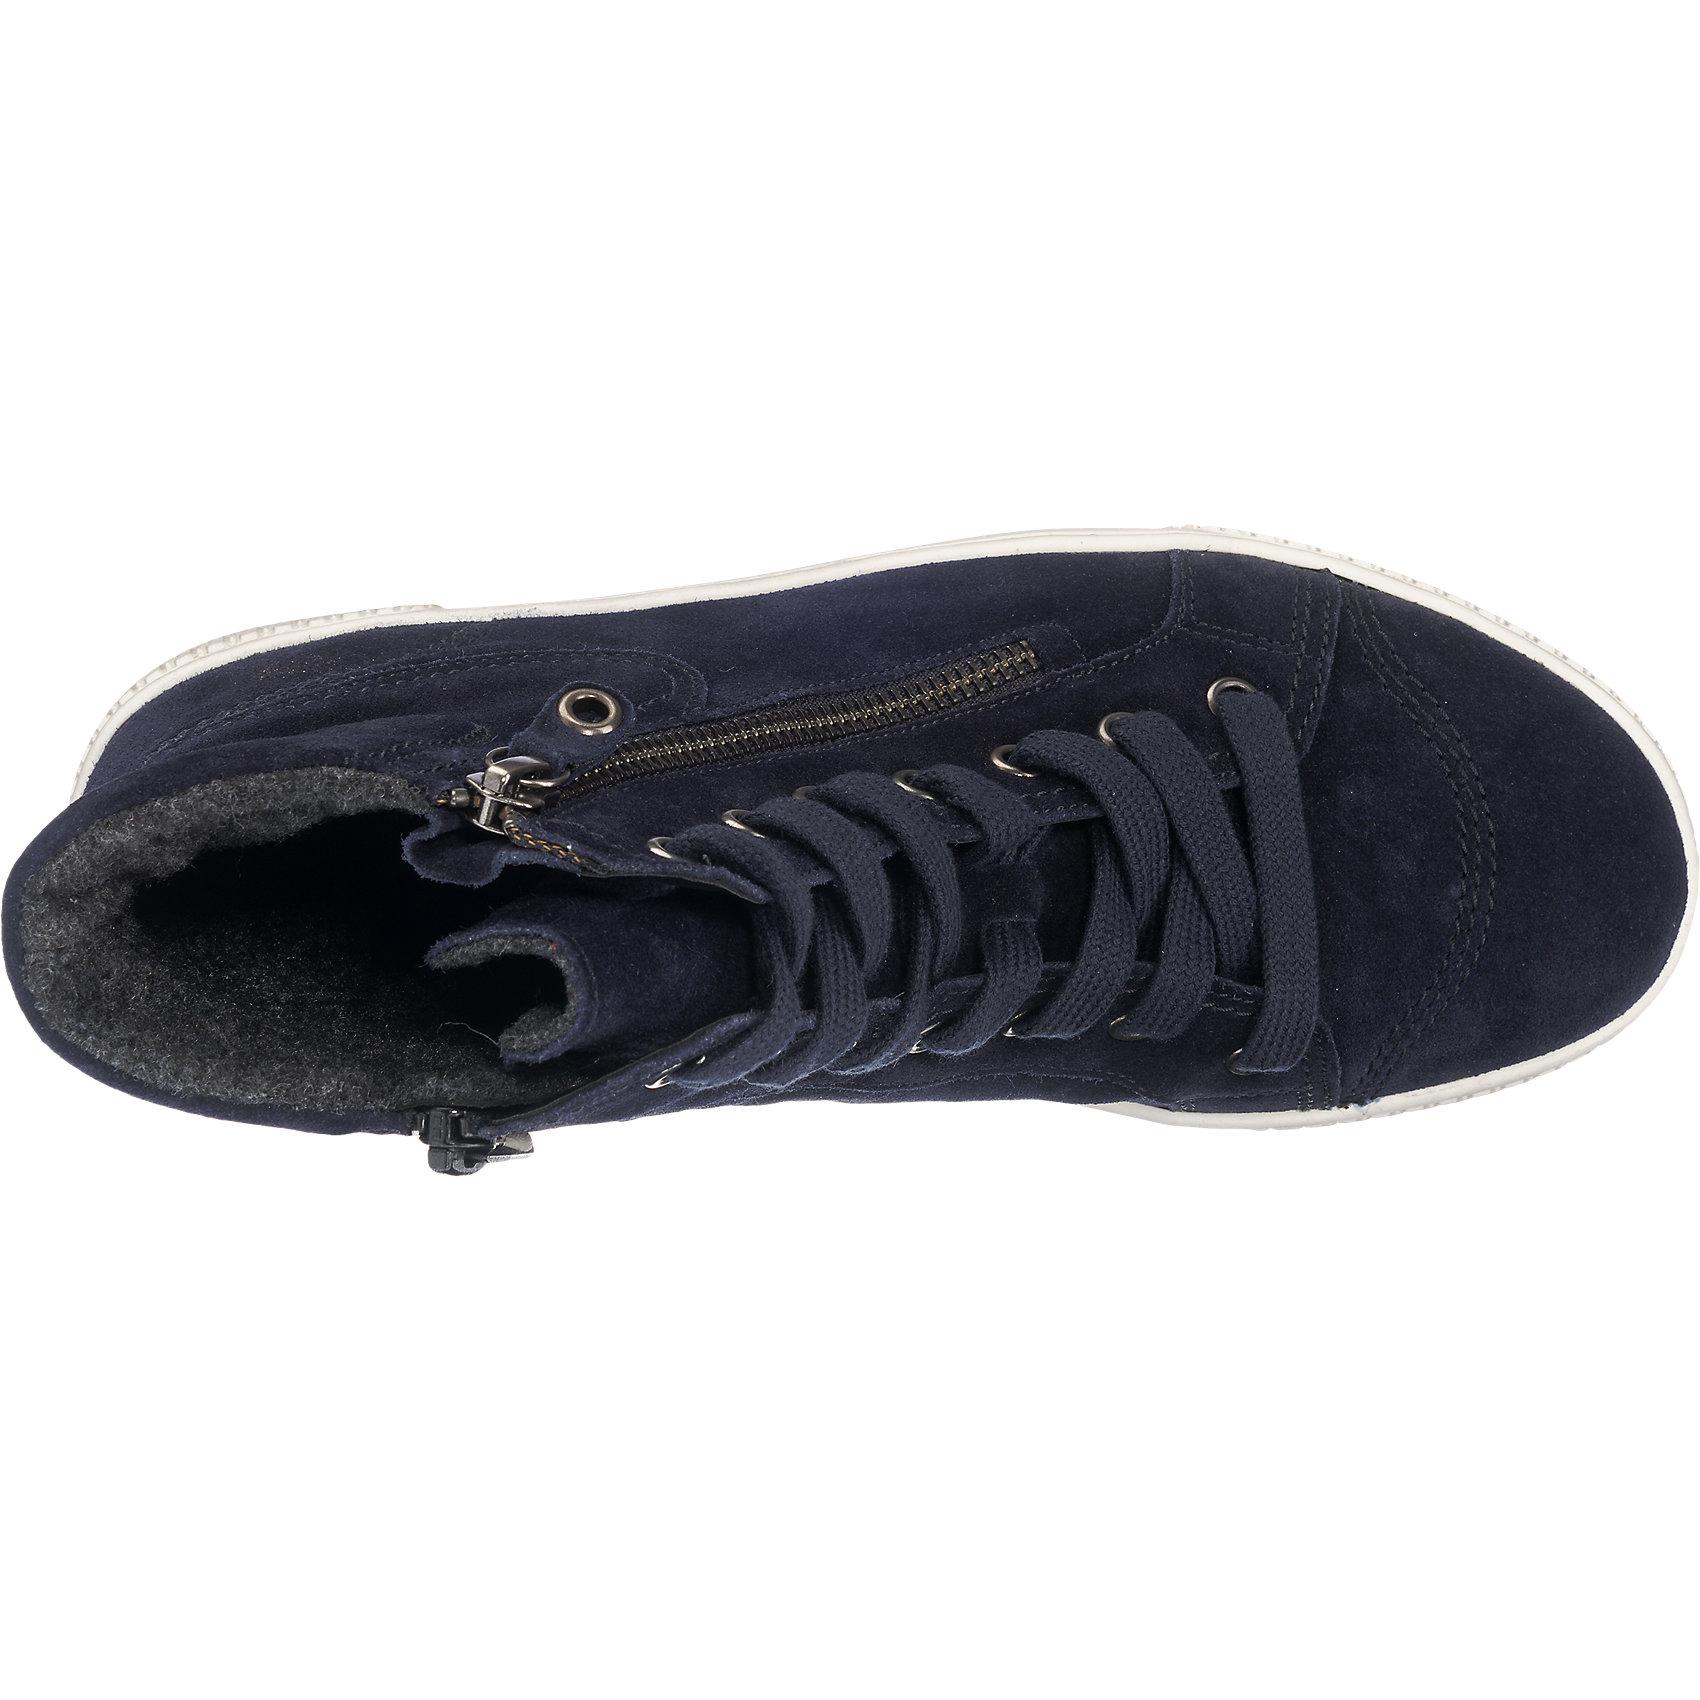 Neu Gabor Stiefeletten rot dunkelgrün cognac grau schwarz blau schwarz grau braun 5760926 6e108b